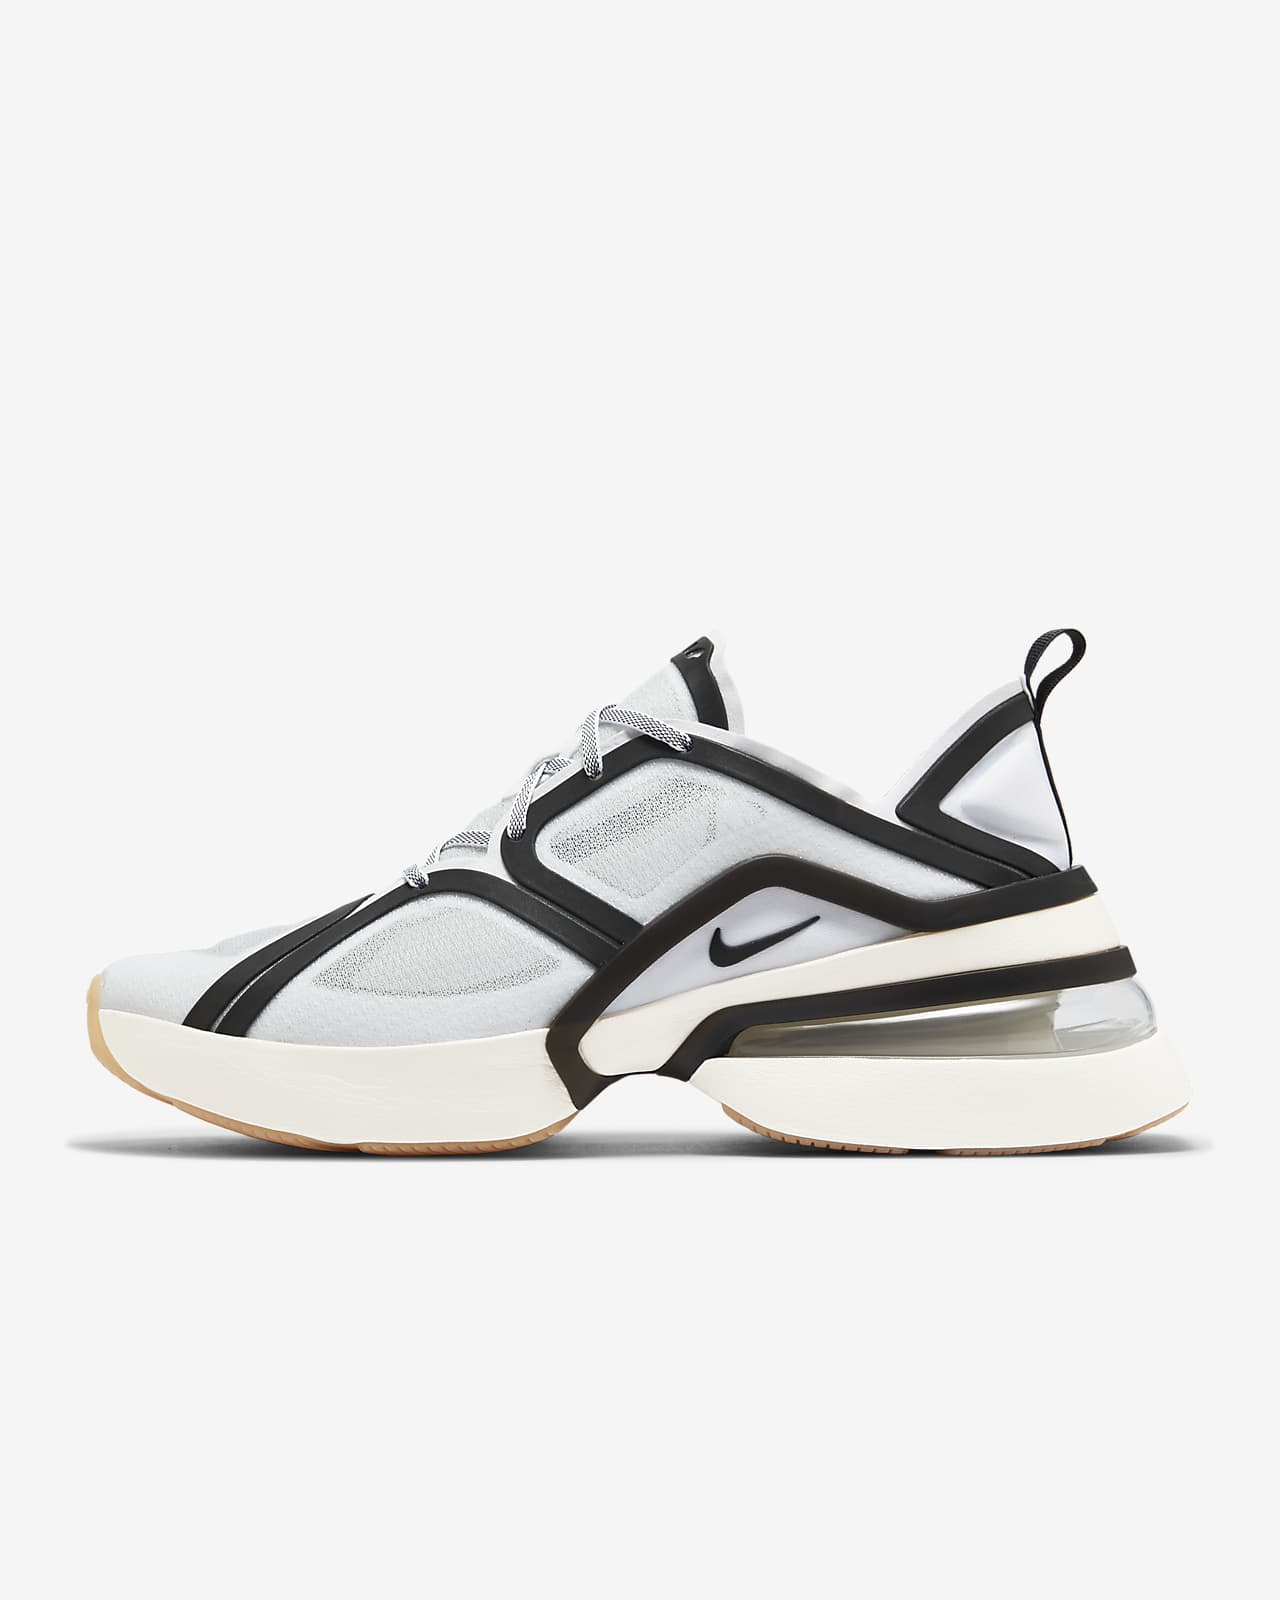 Dámská bota Nike Air Max 270 XX